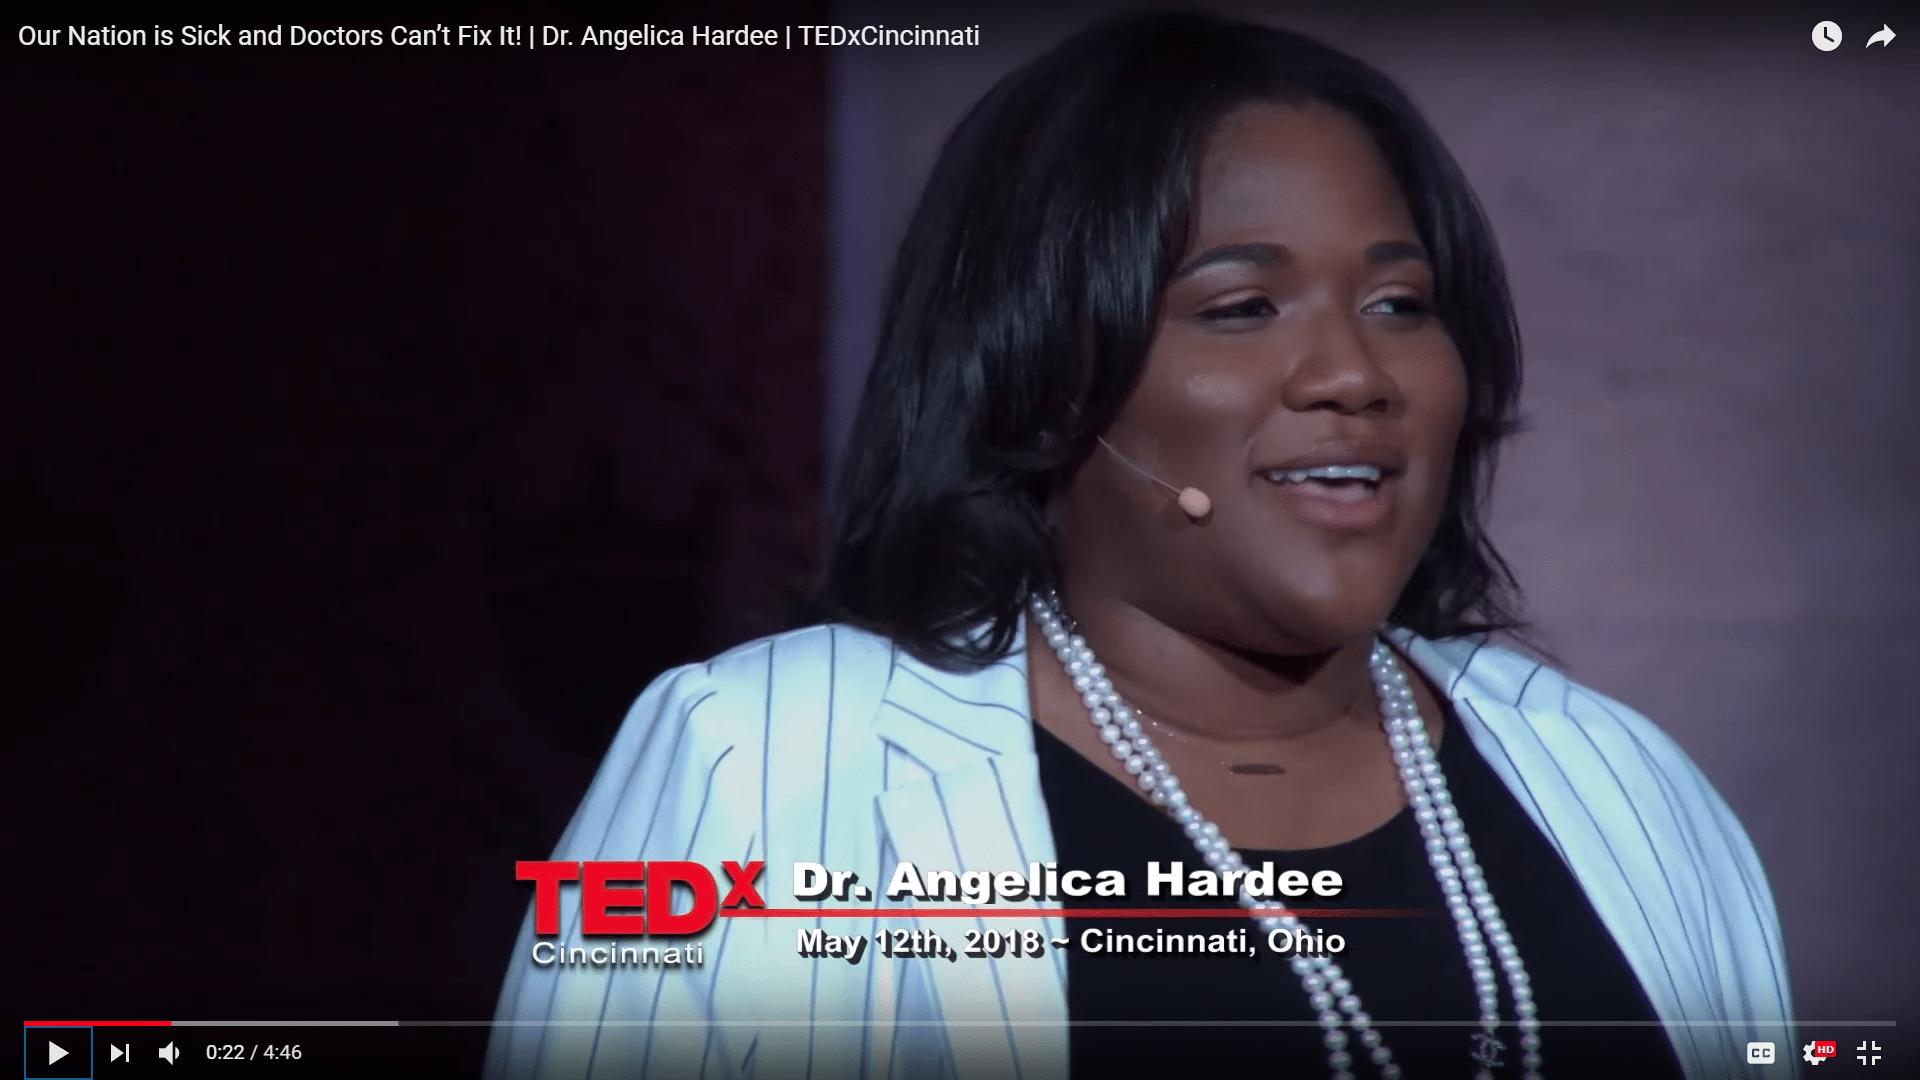 [VIDEO] Dr. Hardee @ TEDx